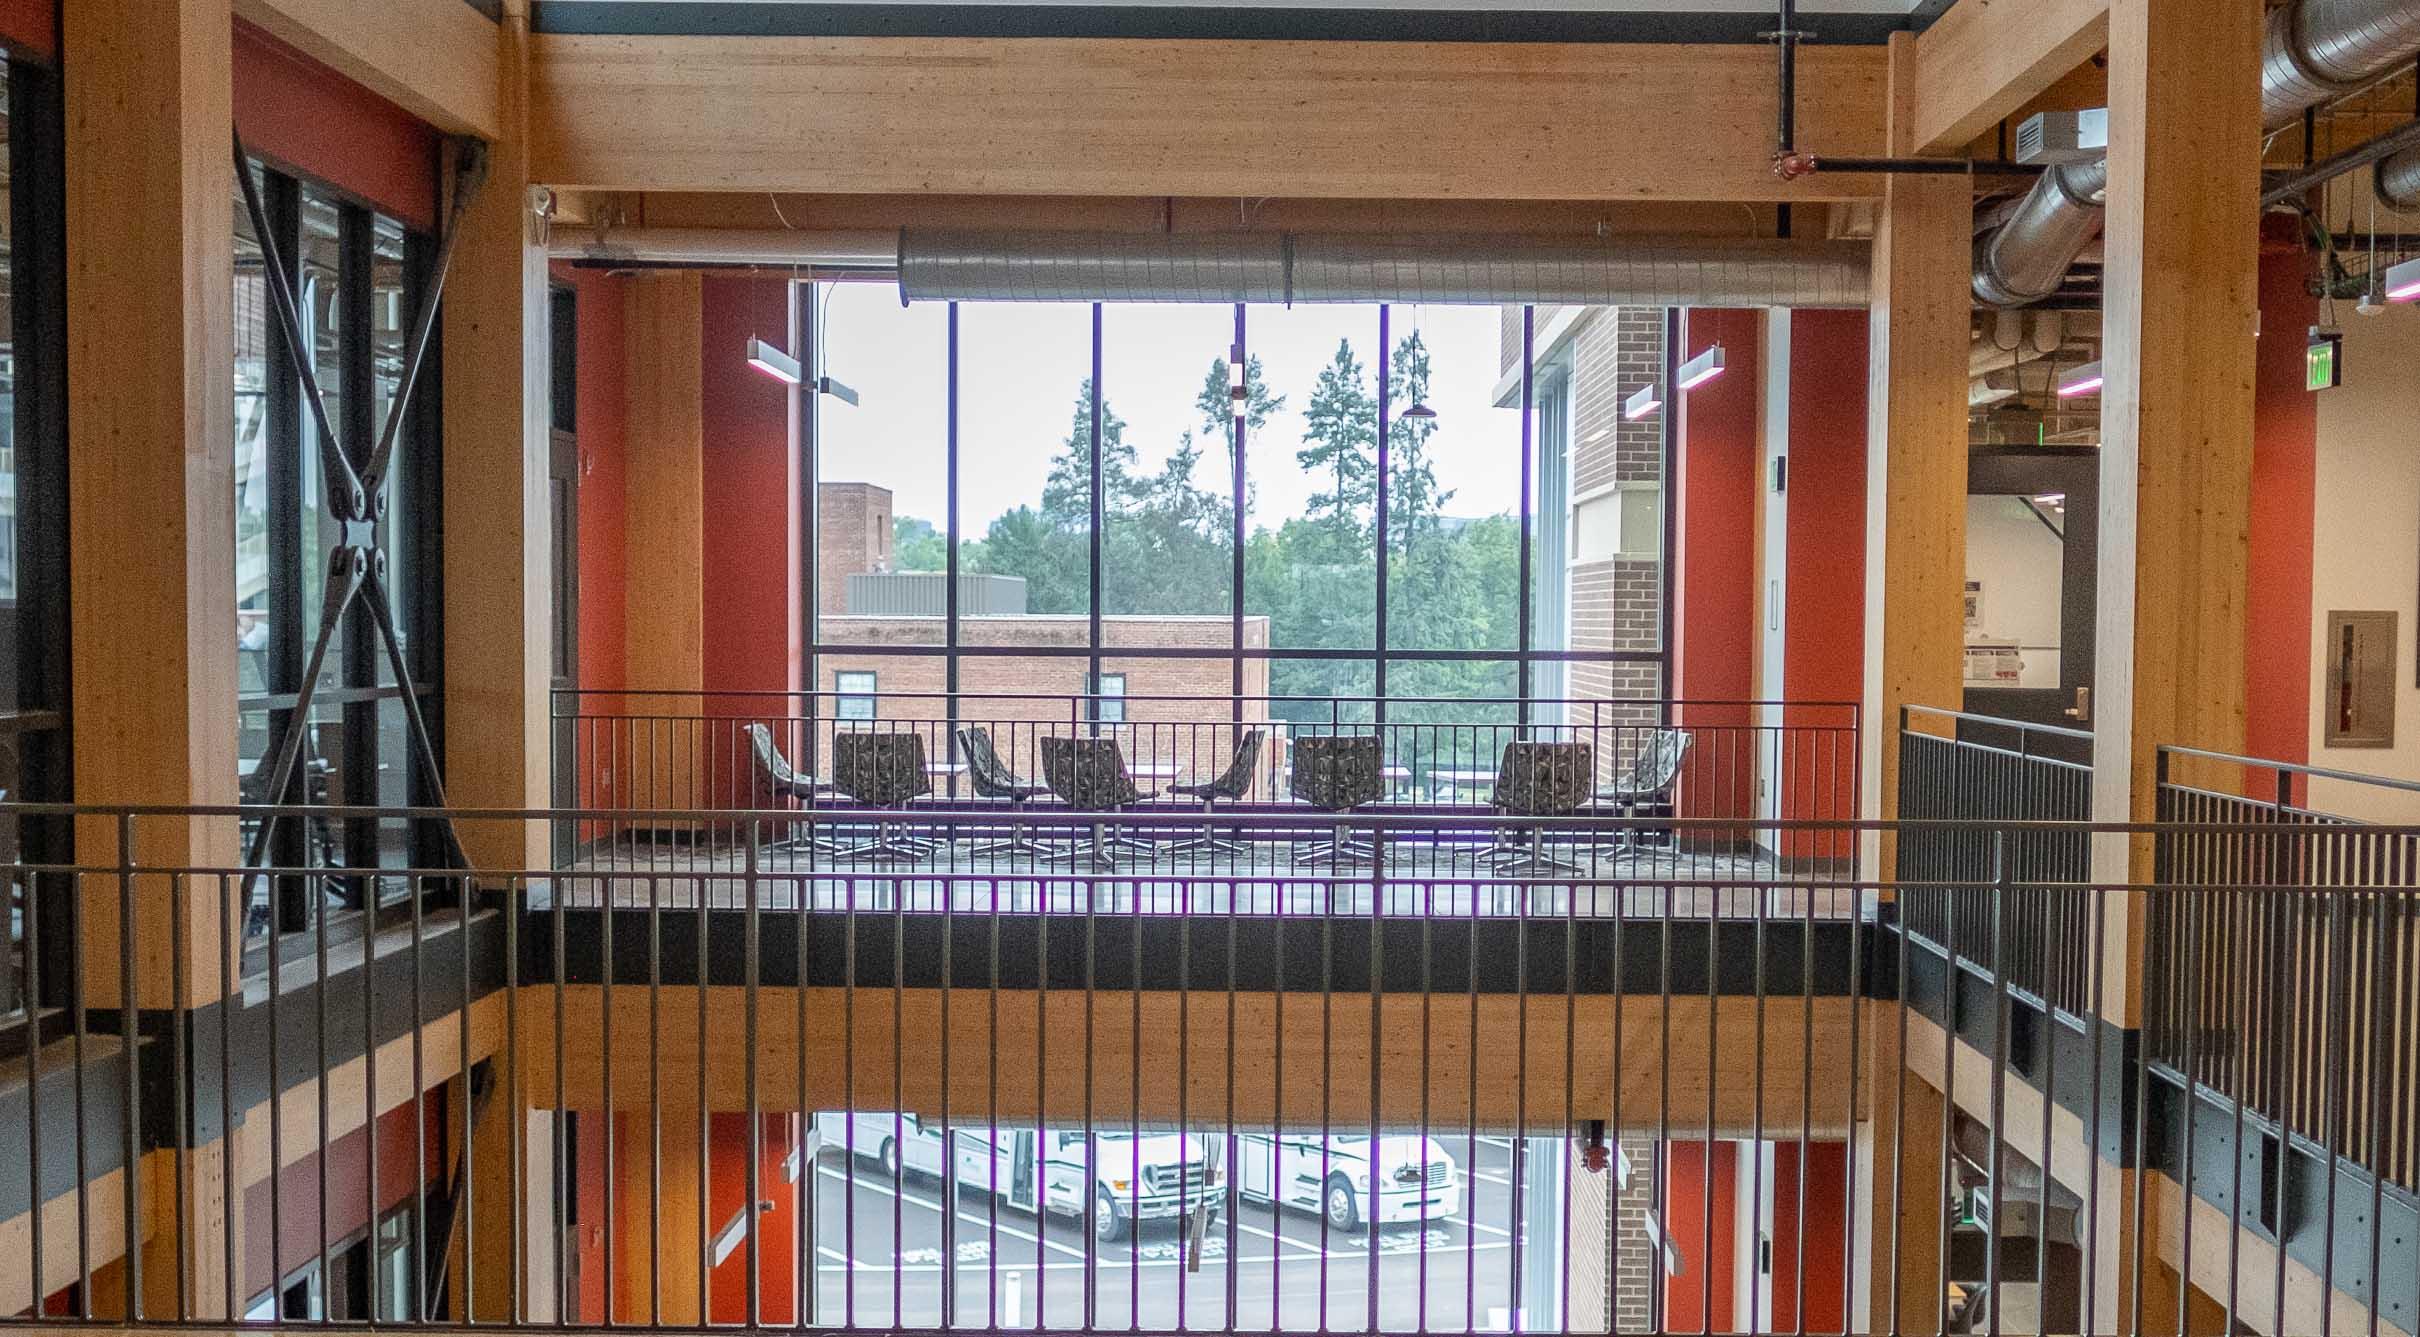 MSU's new Stem teaching building